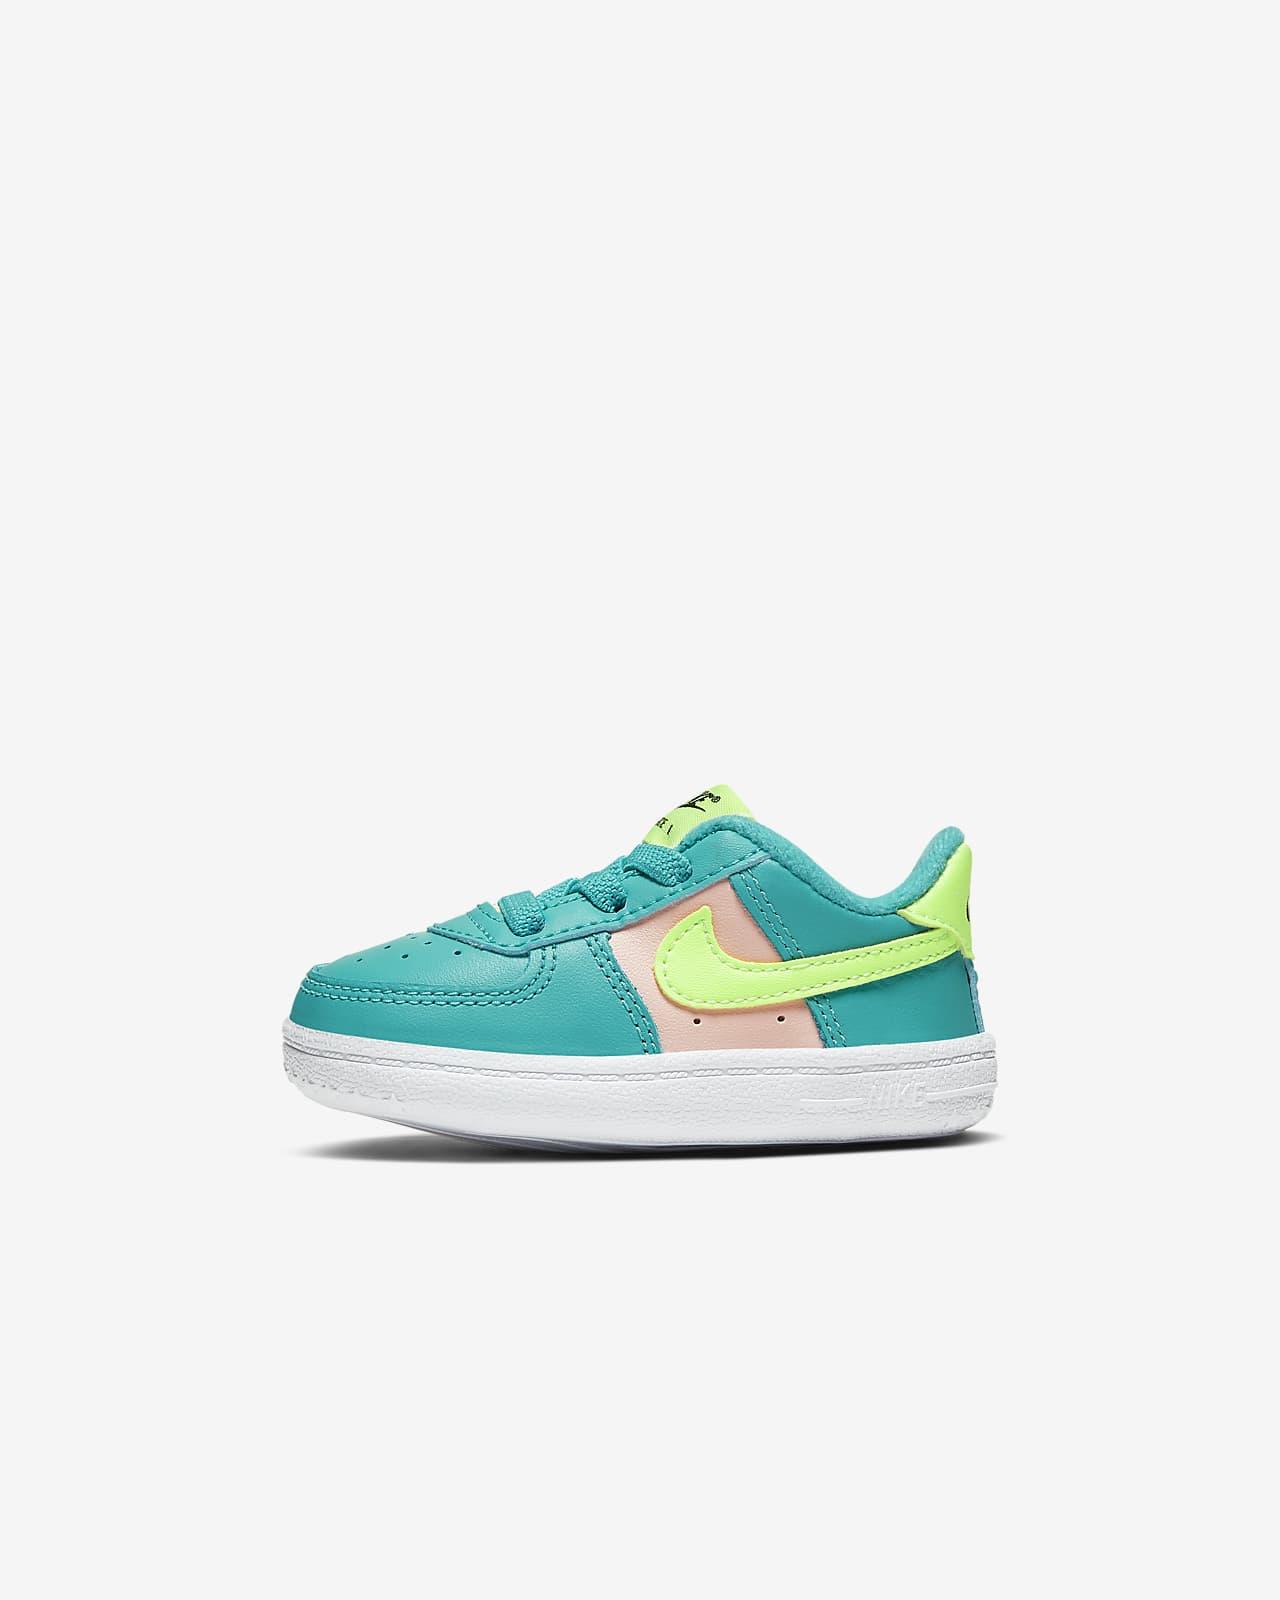 Sko Nike Force 1 Crib för baby